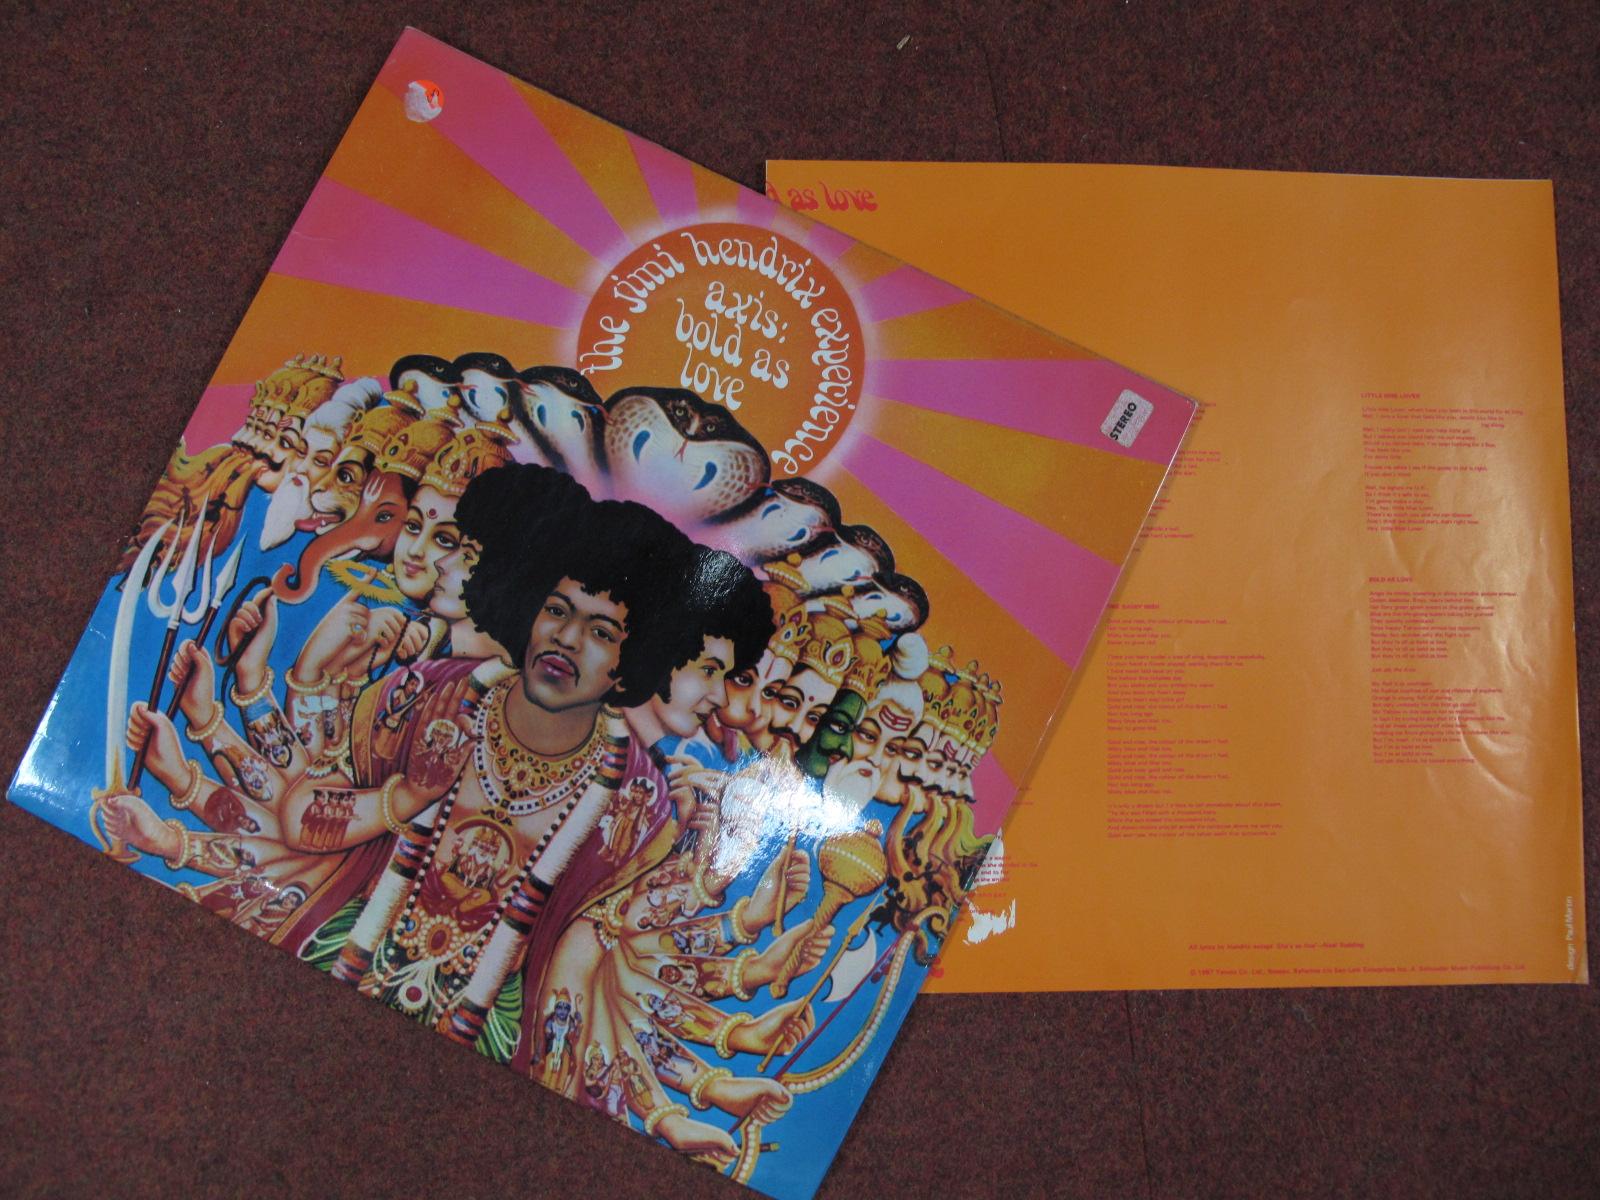 Lot 735 - Jimi Hendrix 'Axis Bold As Love' LP, 1967, (Track stereo 613003 A1/B1 matrix, laminated flip Earnest